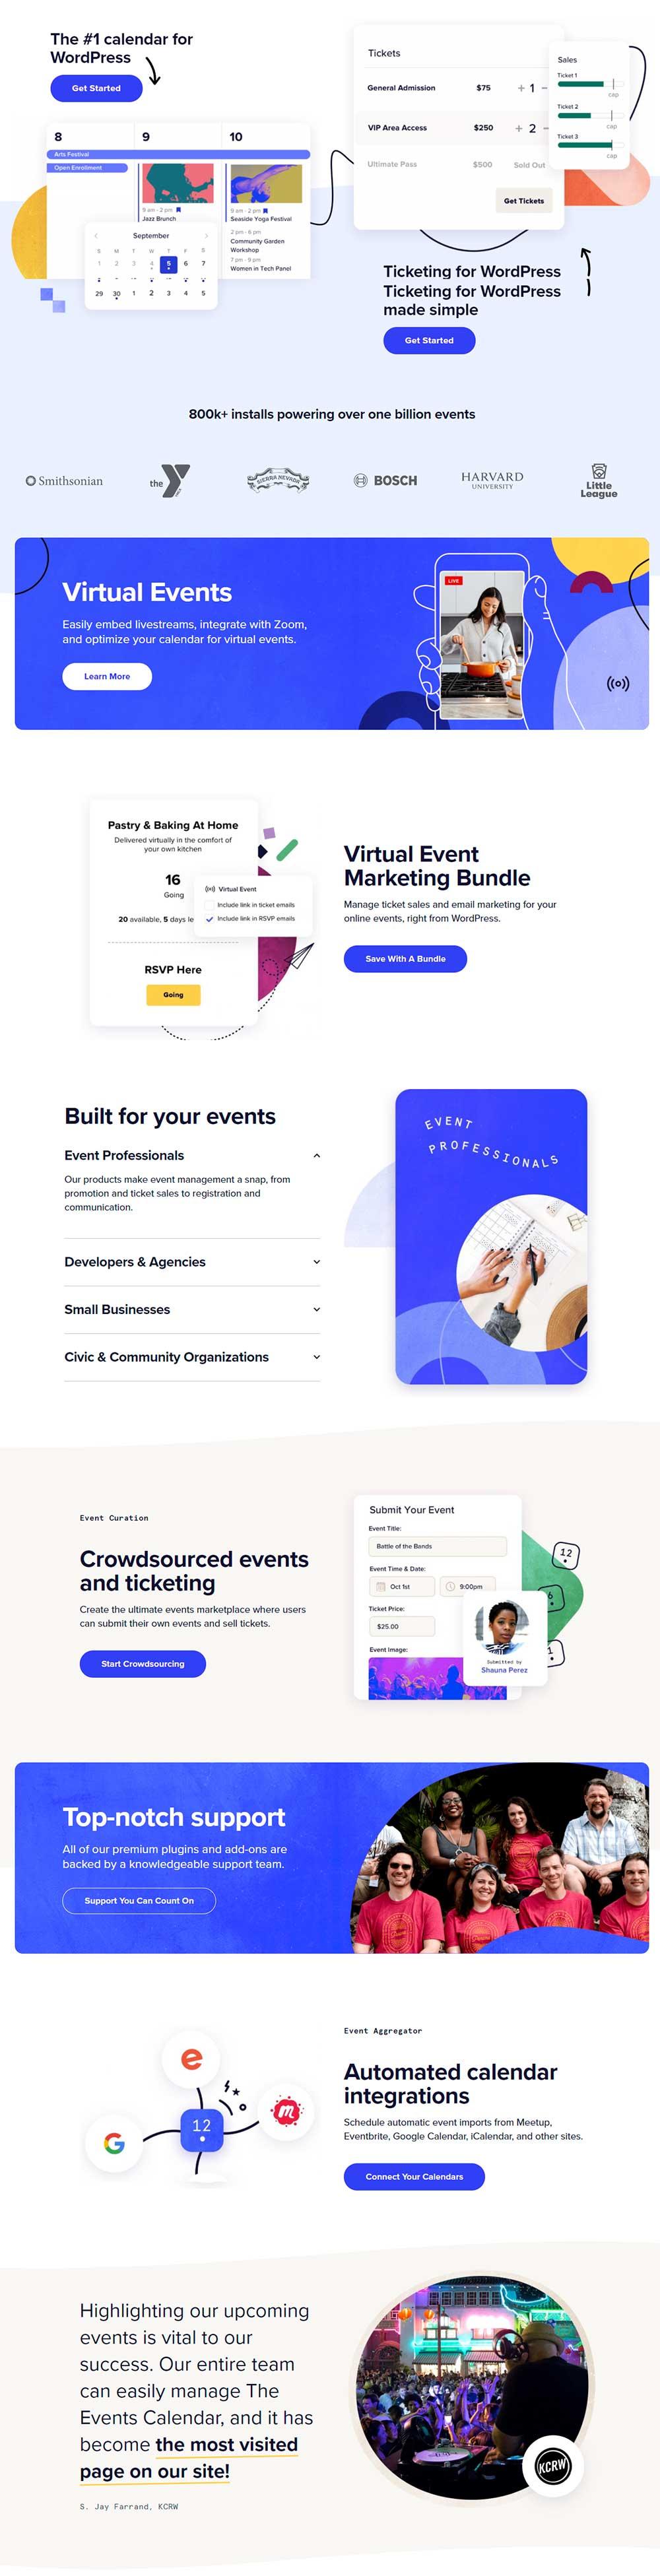 The Events Calendar - WordPress Calendar Plugin